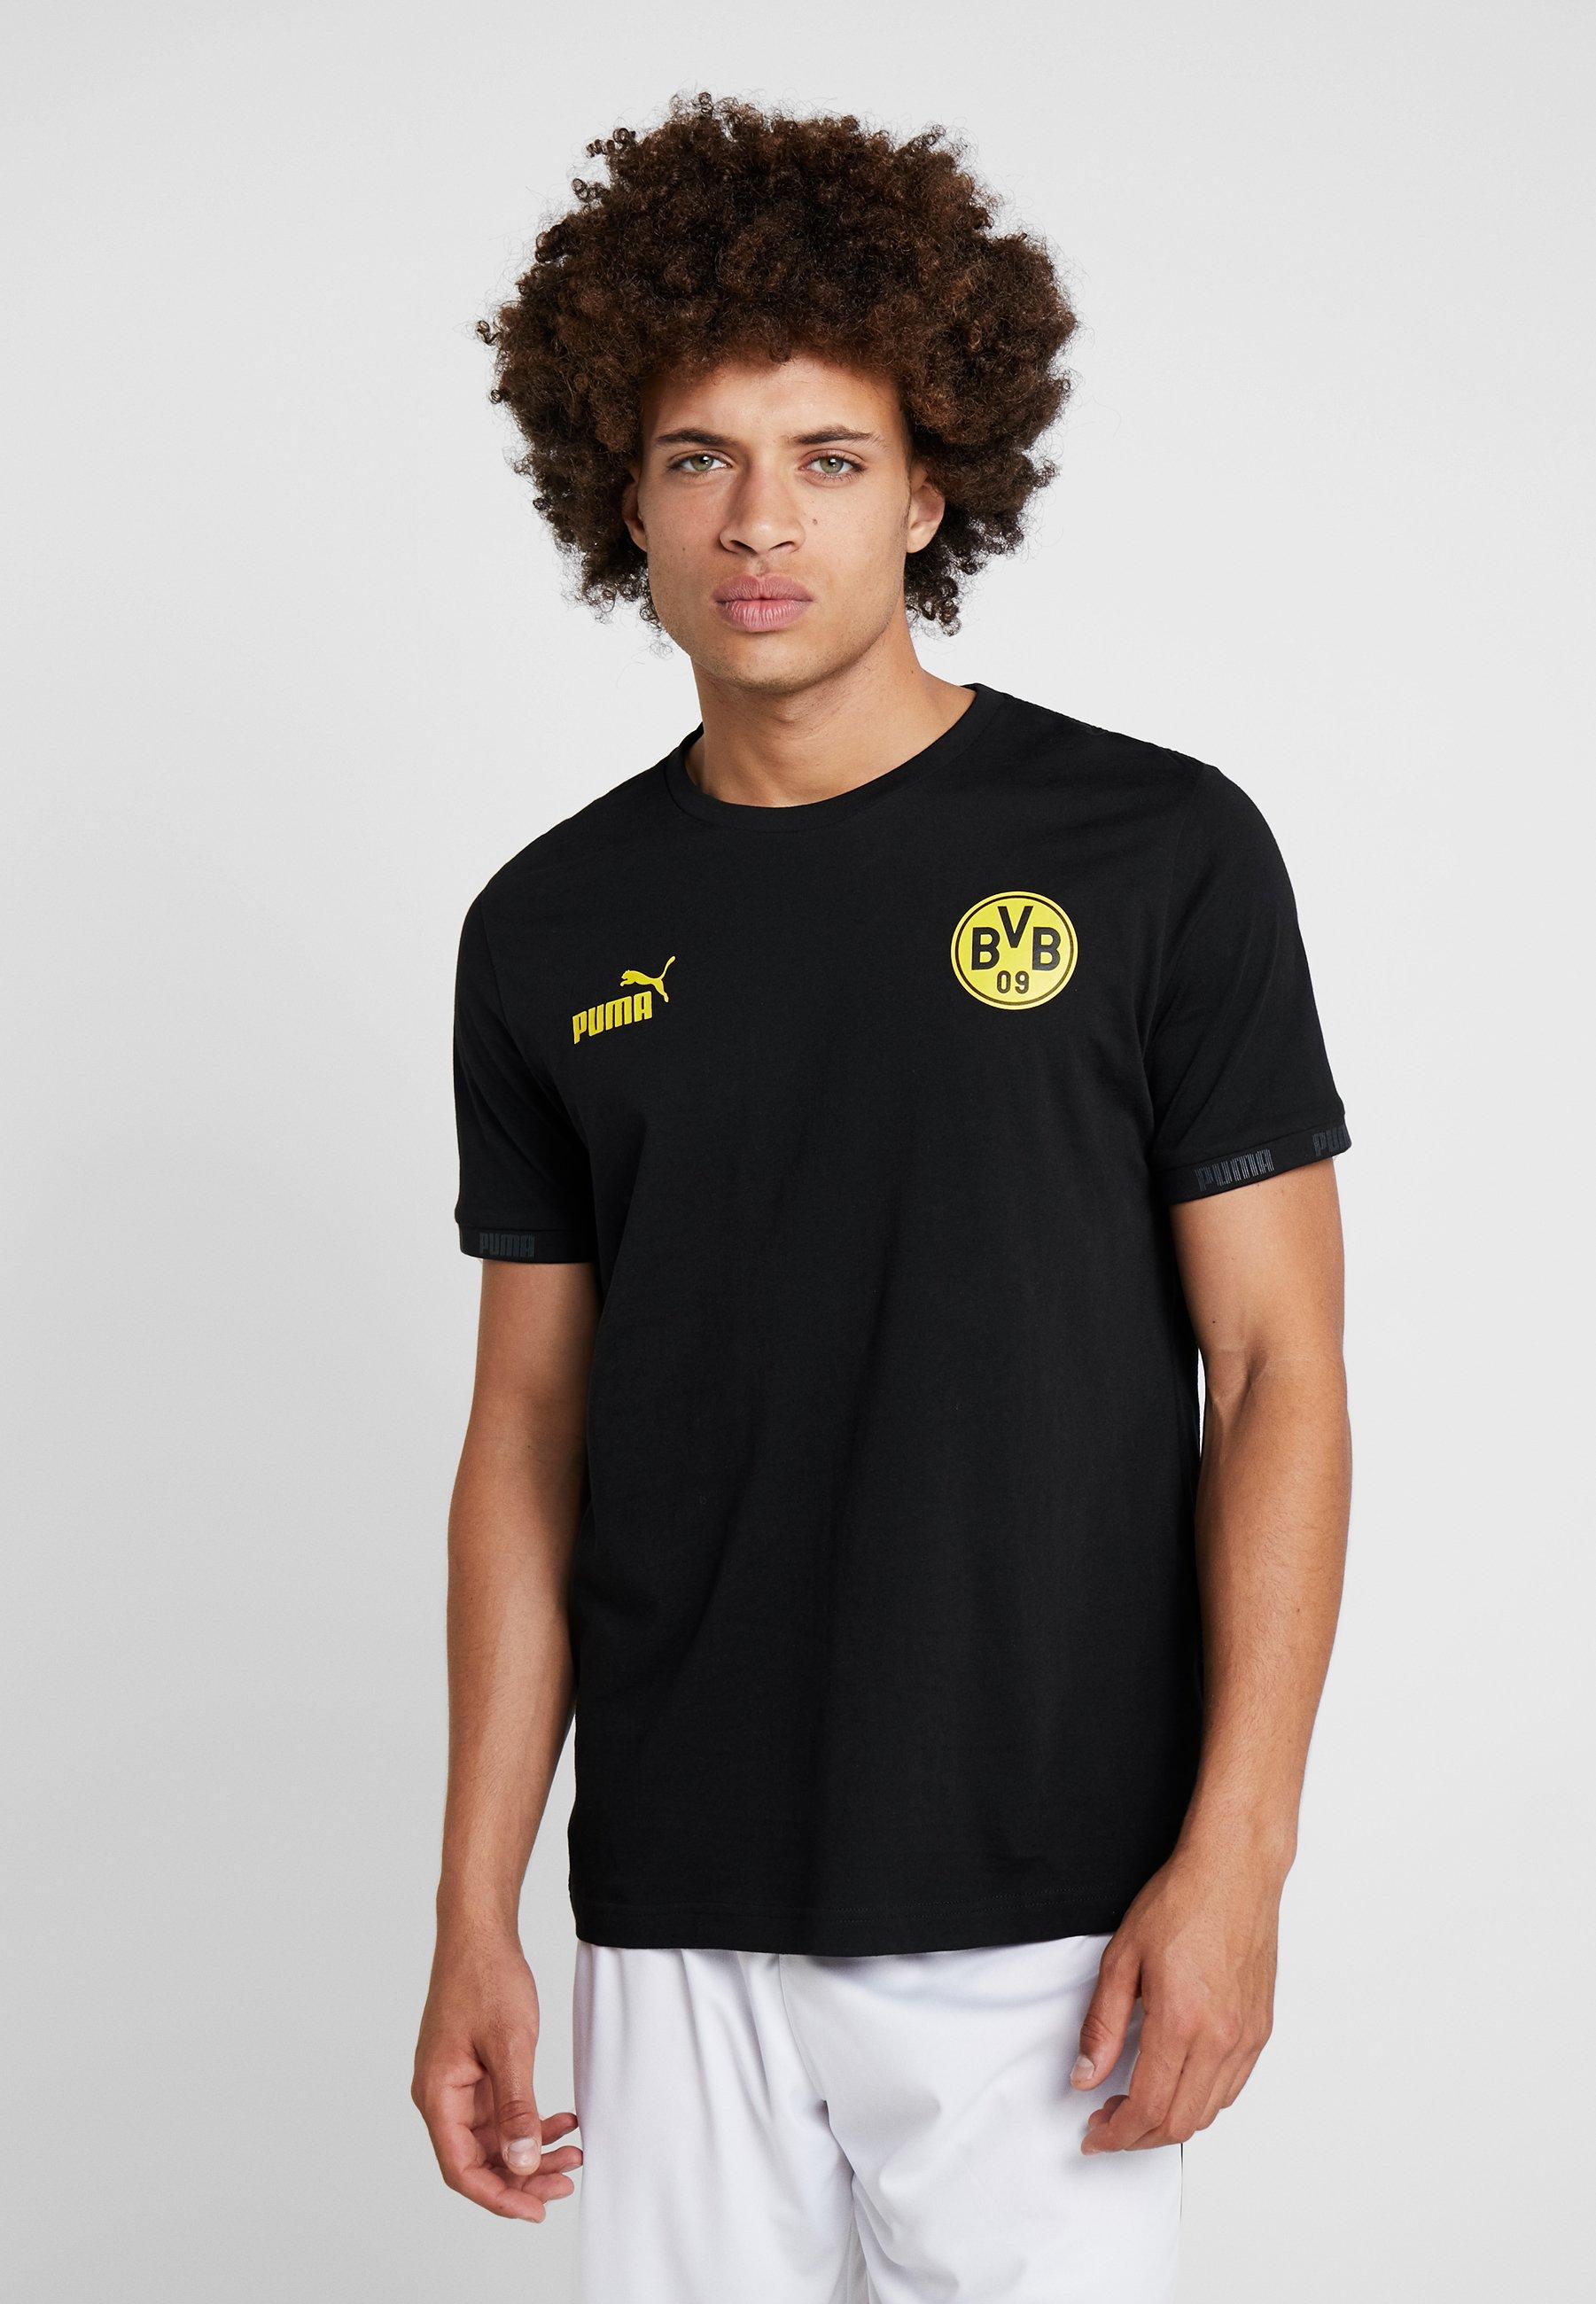 Borussia Bvb Culture Supporter De Puma TeeArticle Dortmund Black MUSqpVz